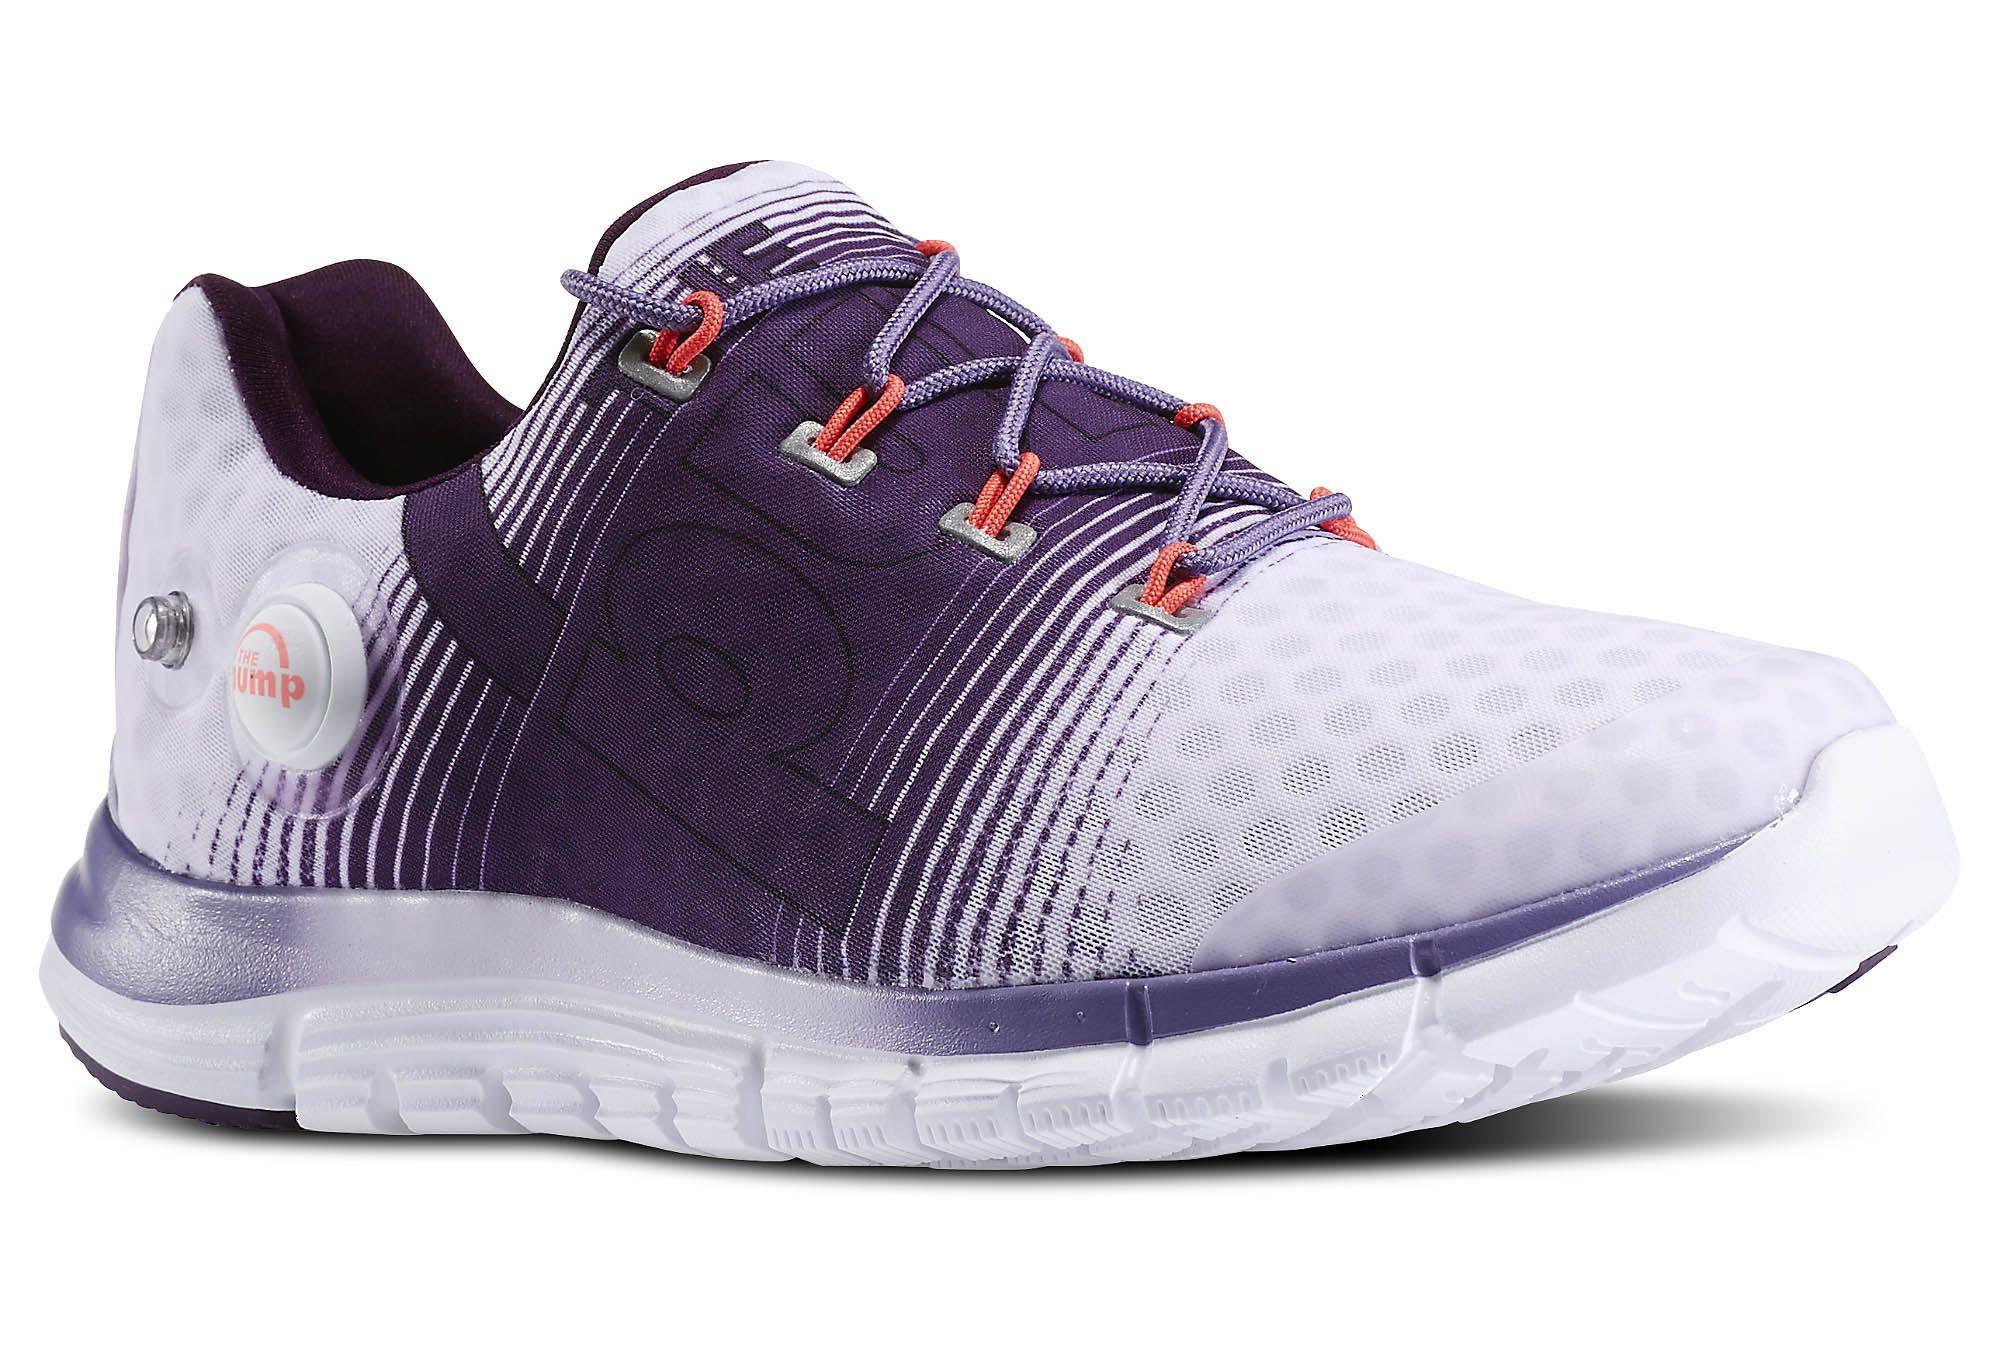 539e890bbf7552 Reebok ZPump Fusion Womens Running Shoes White Purple